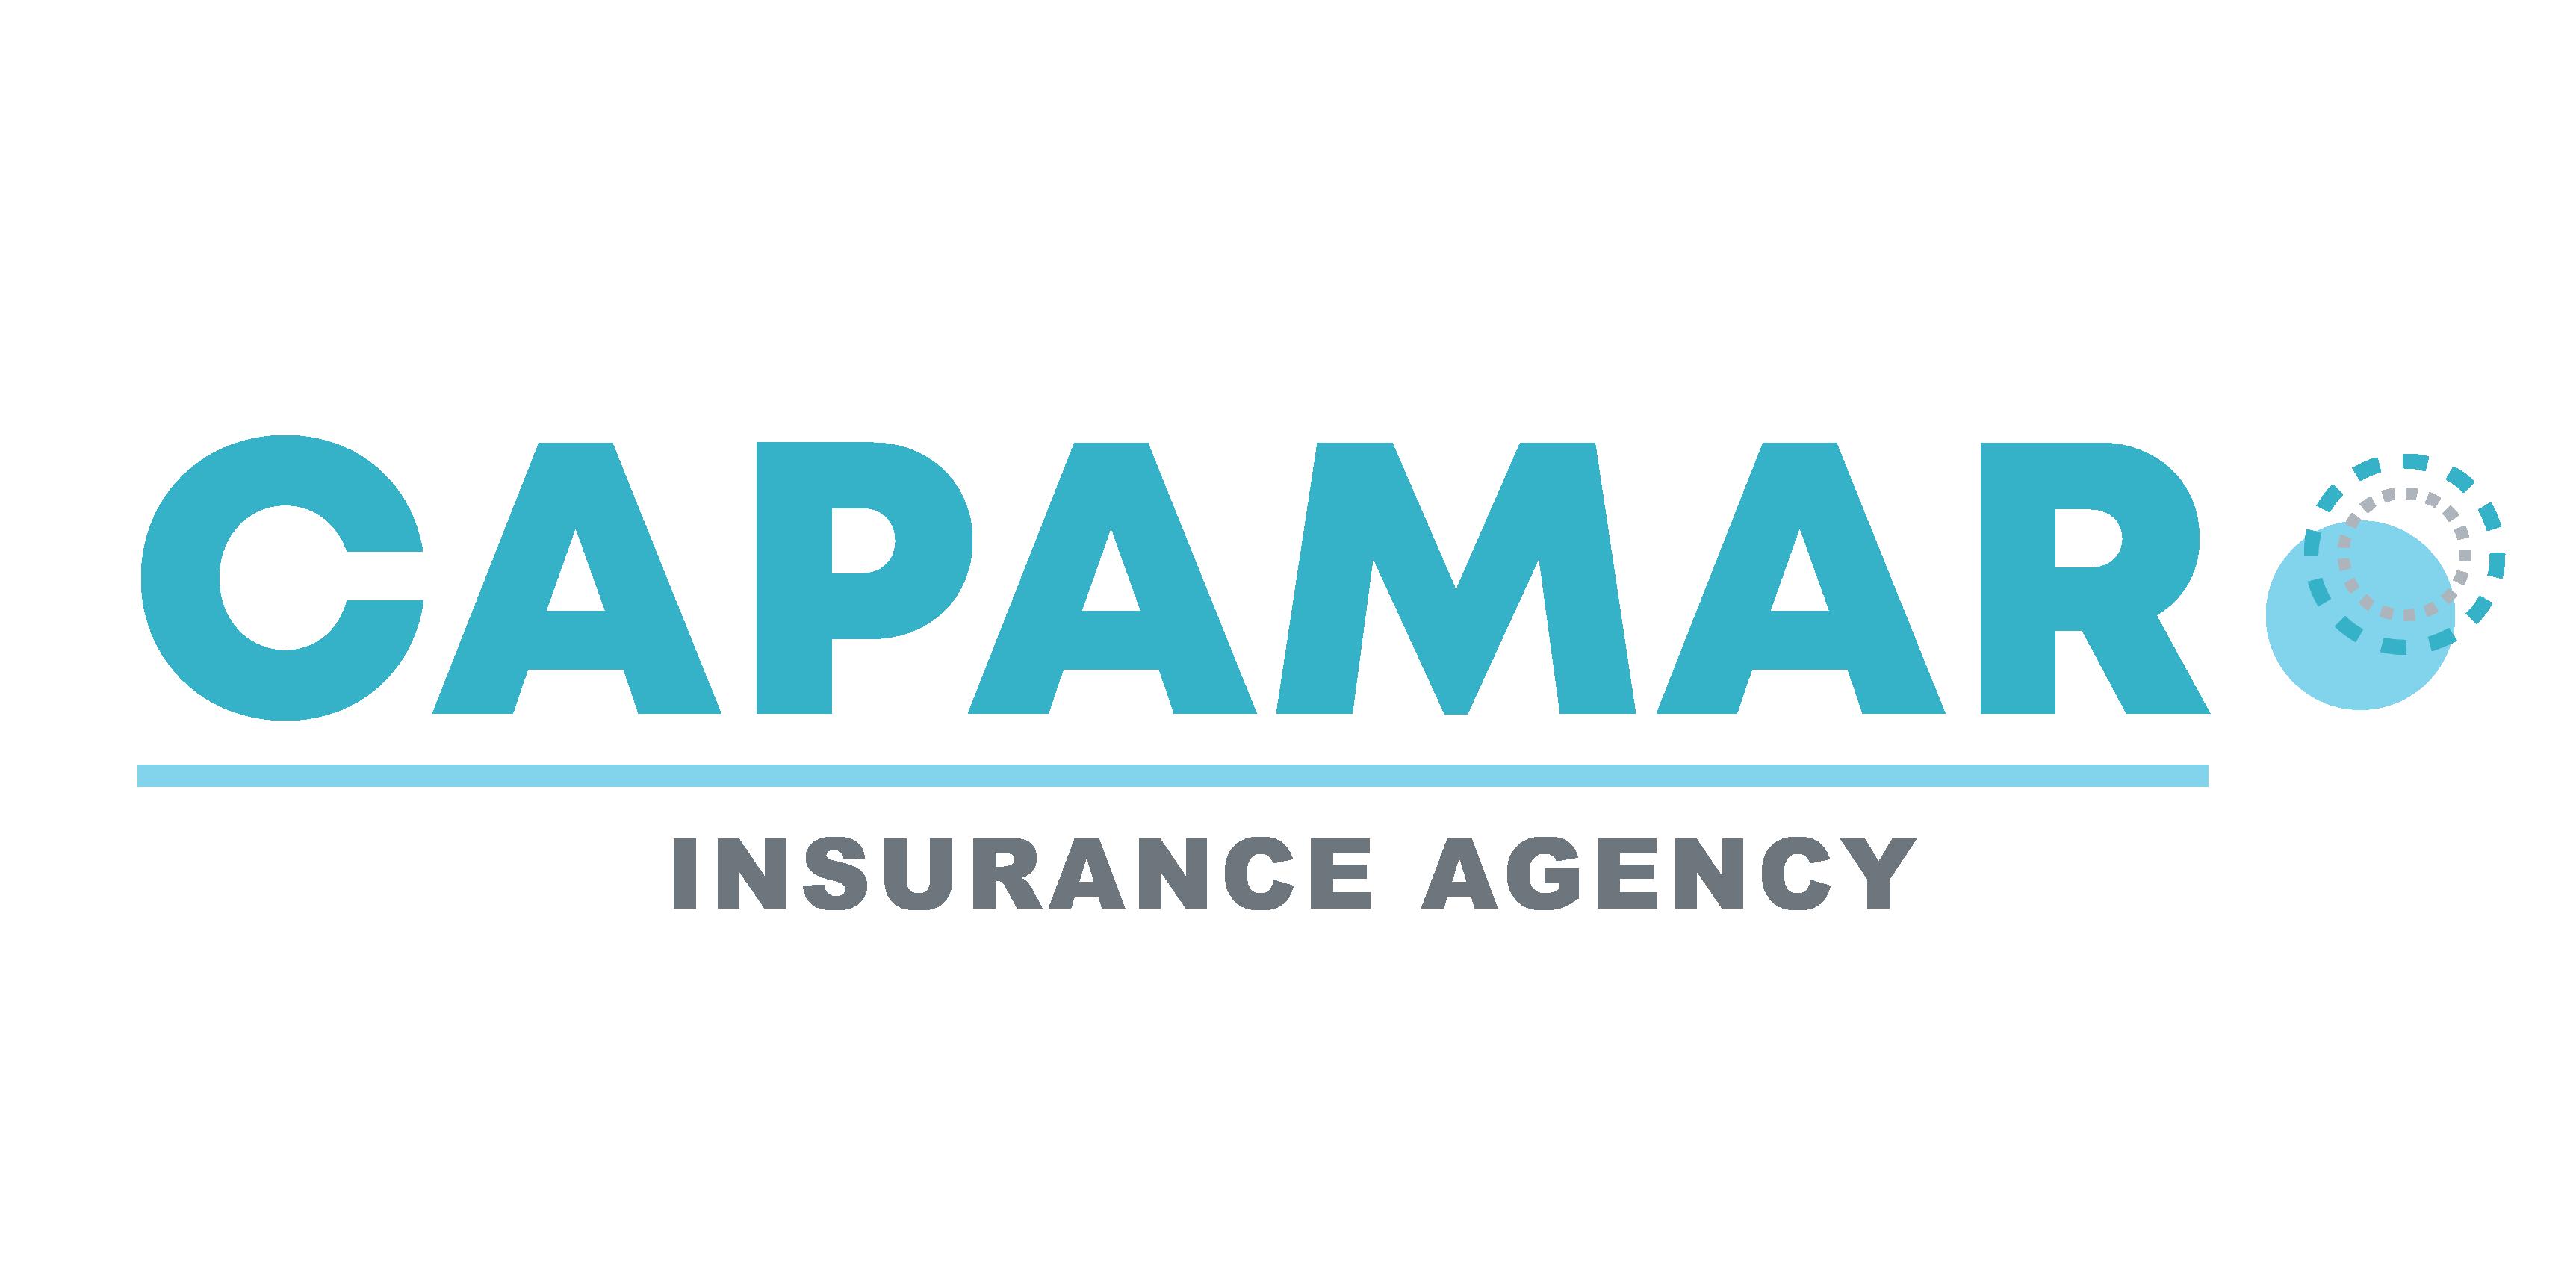 Capamar Insurance